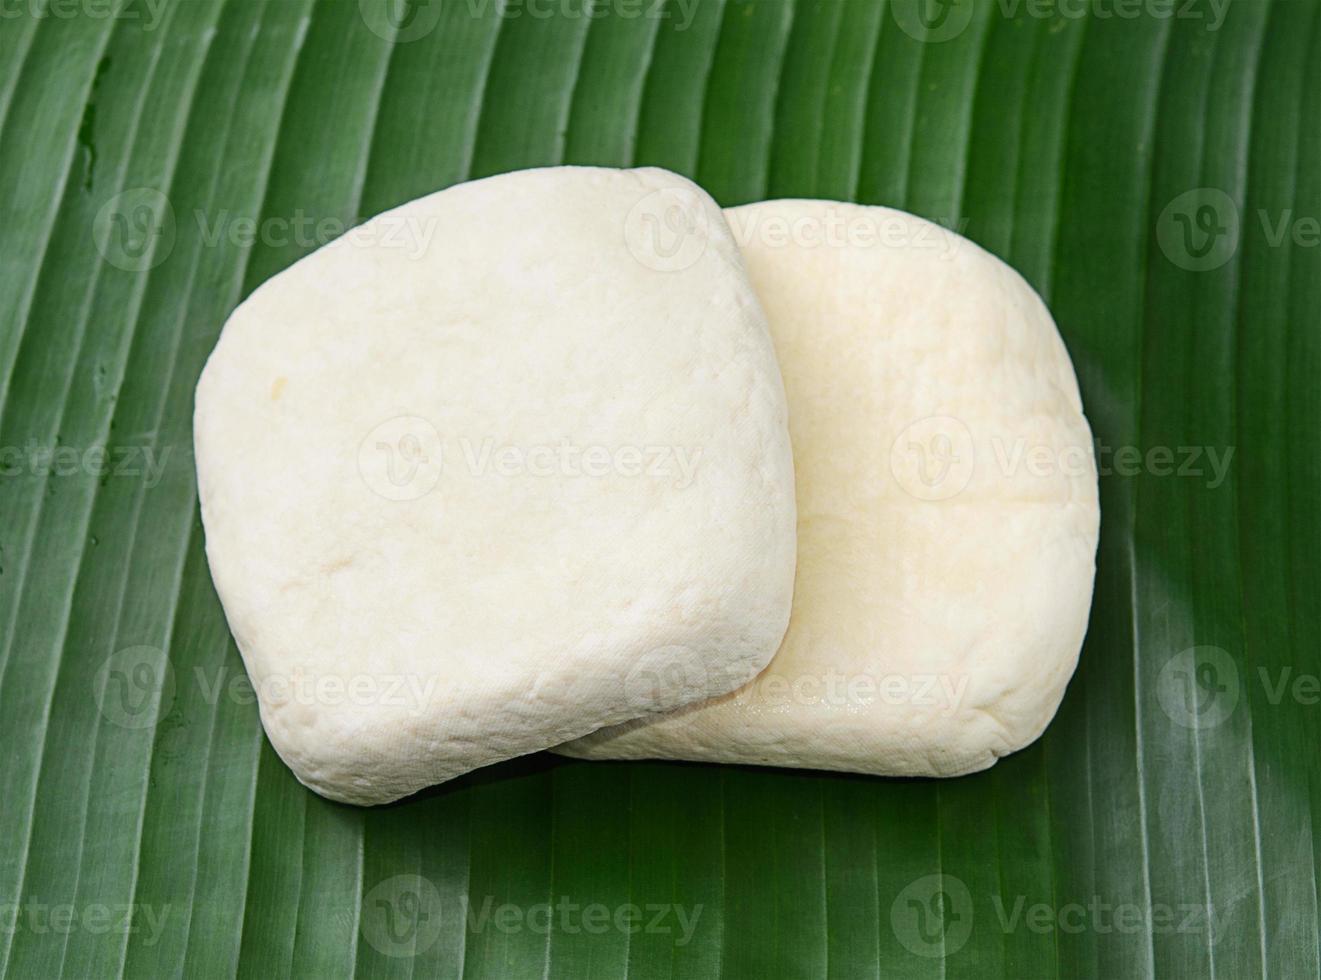 cubos de tofu fresco foto